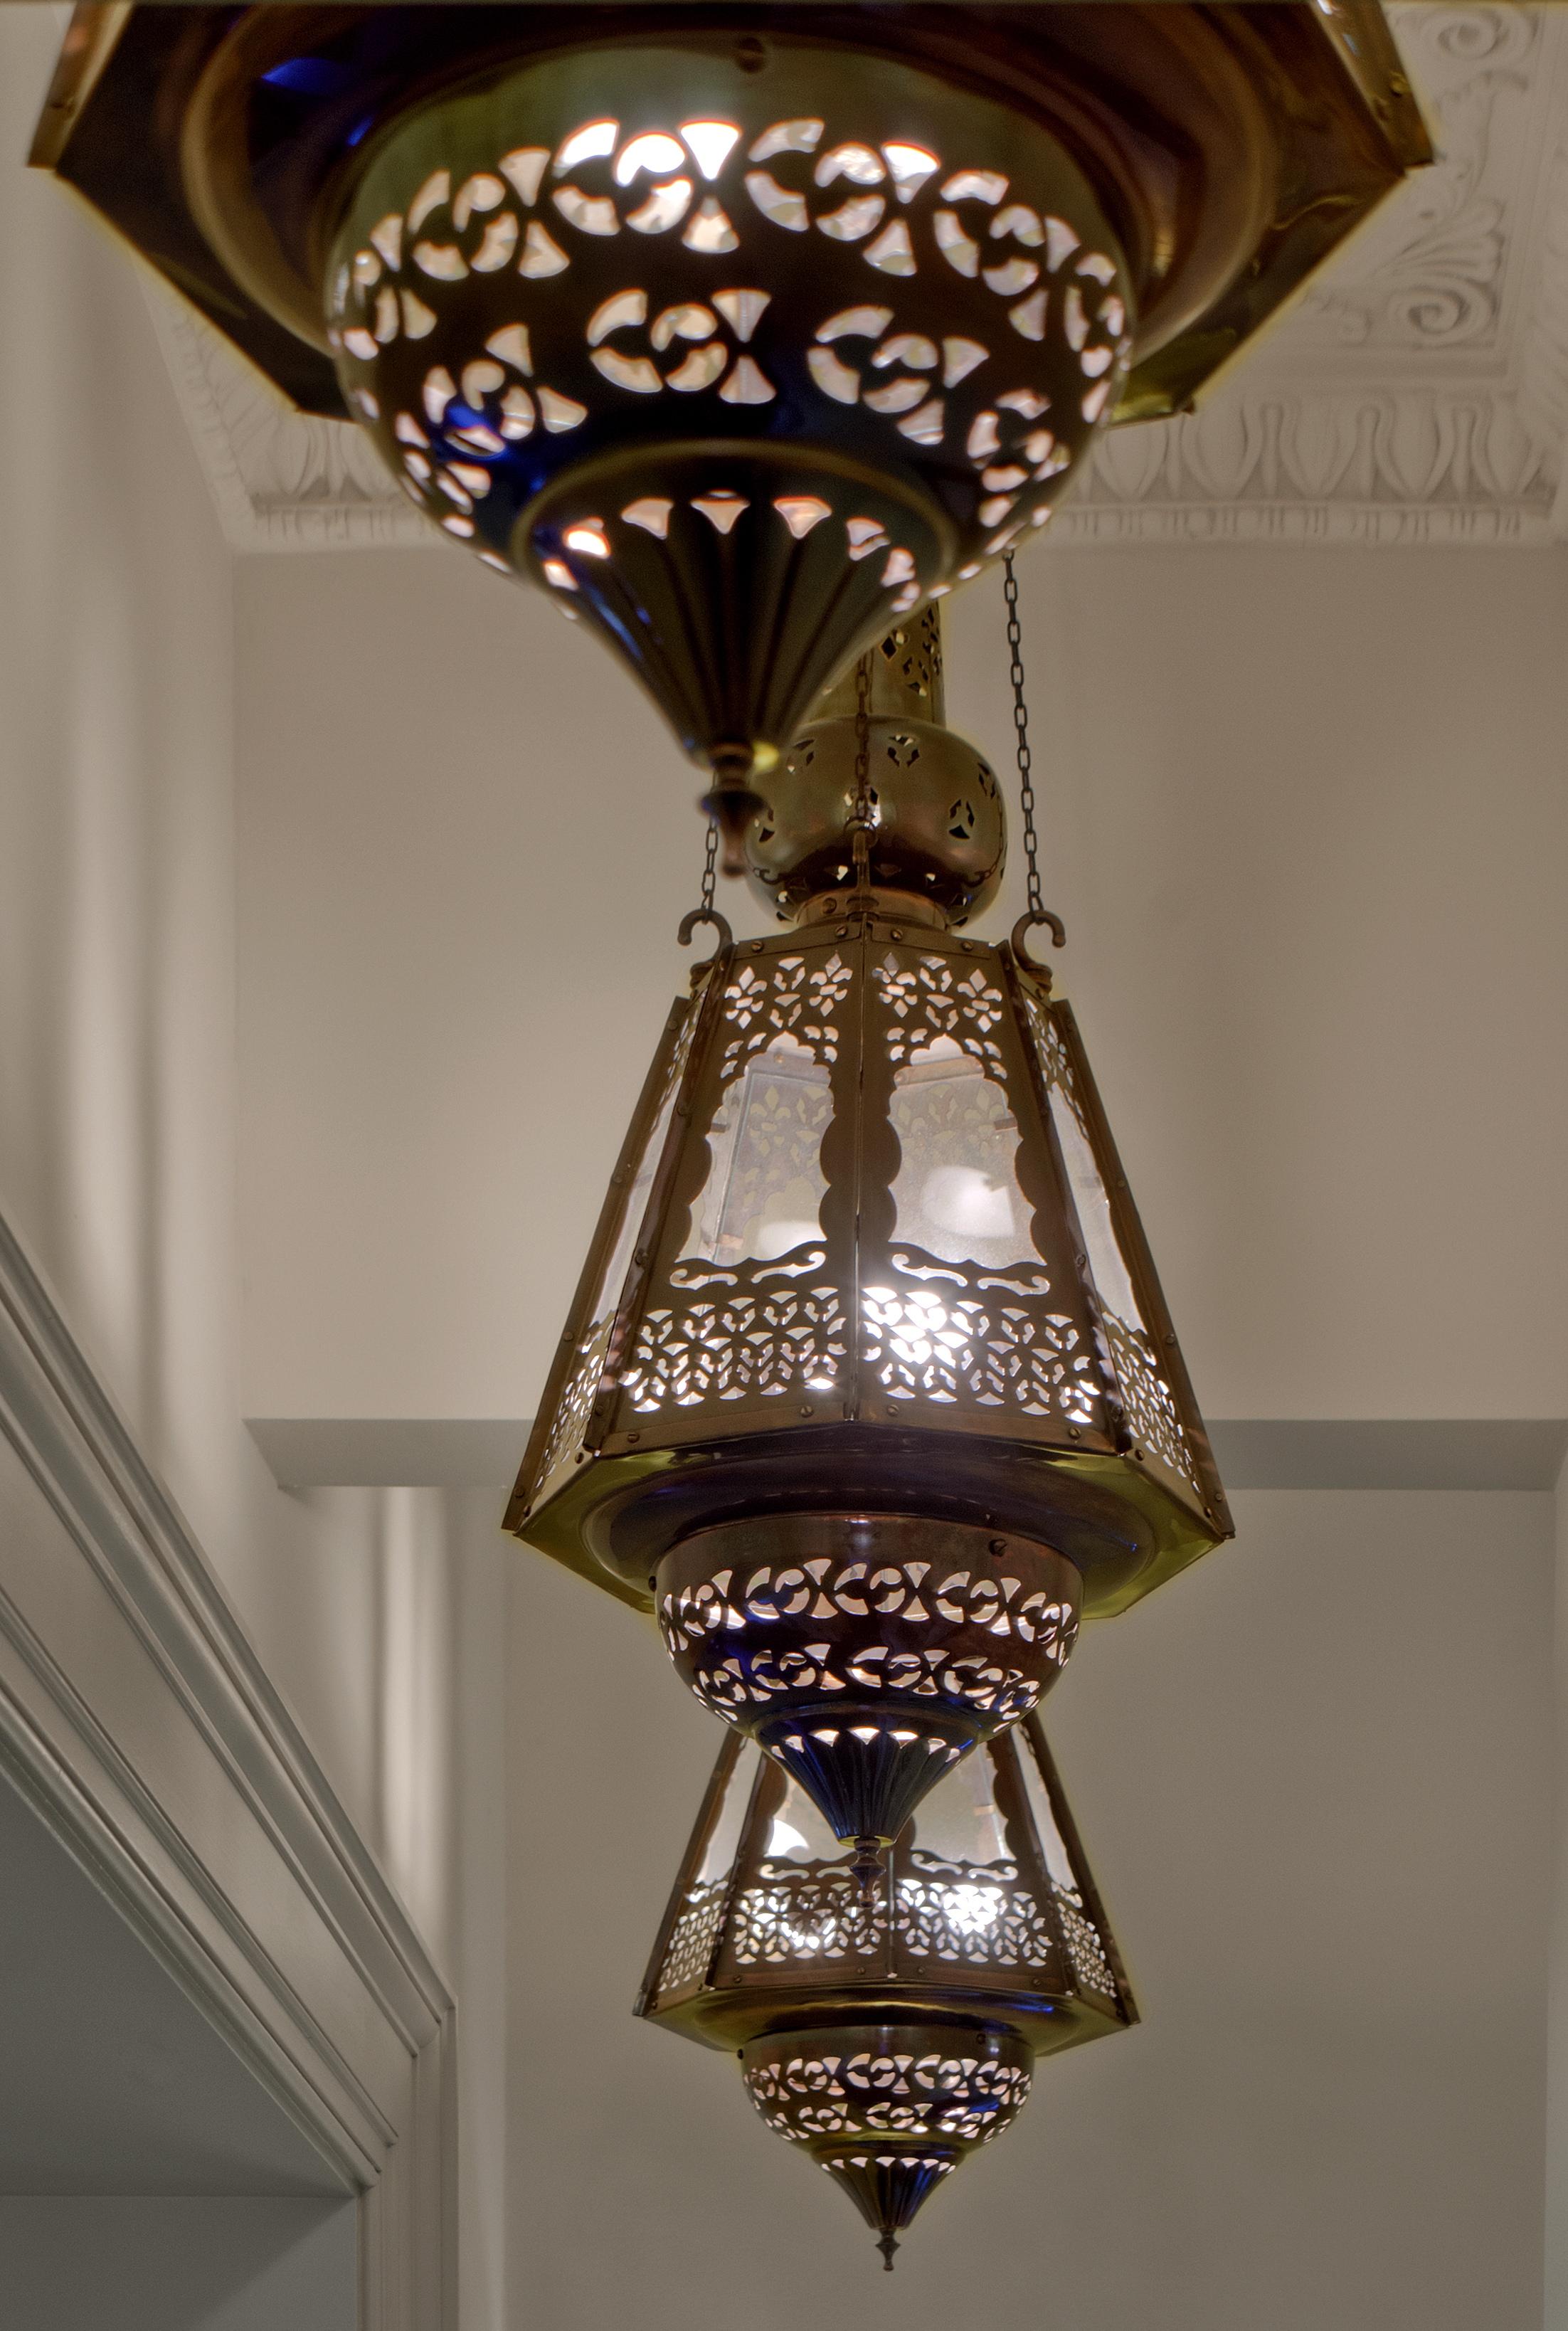 10 - Accessories-Lamp3.jpg